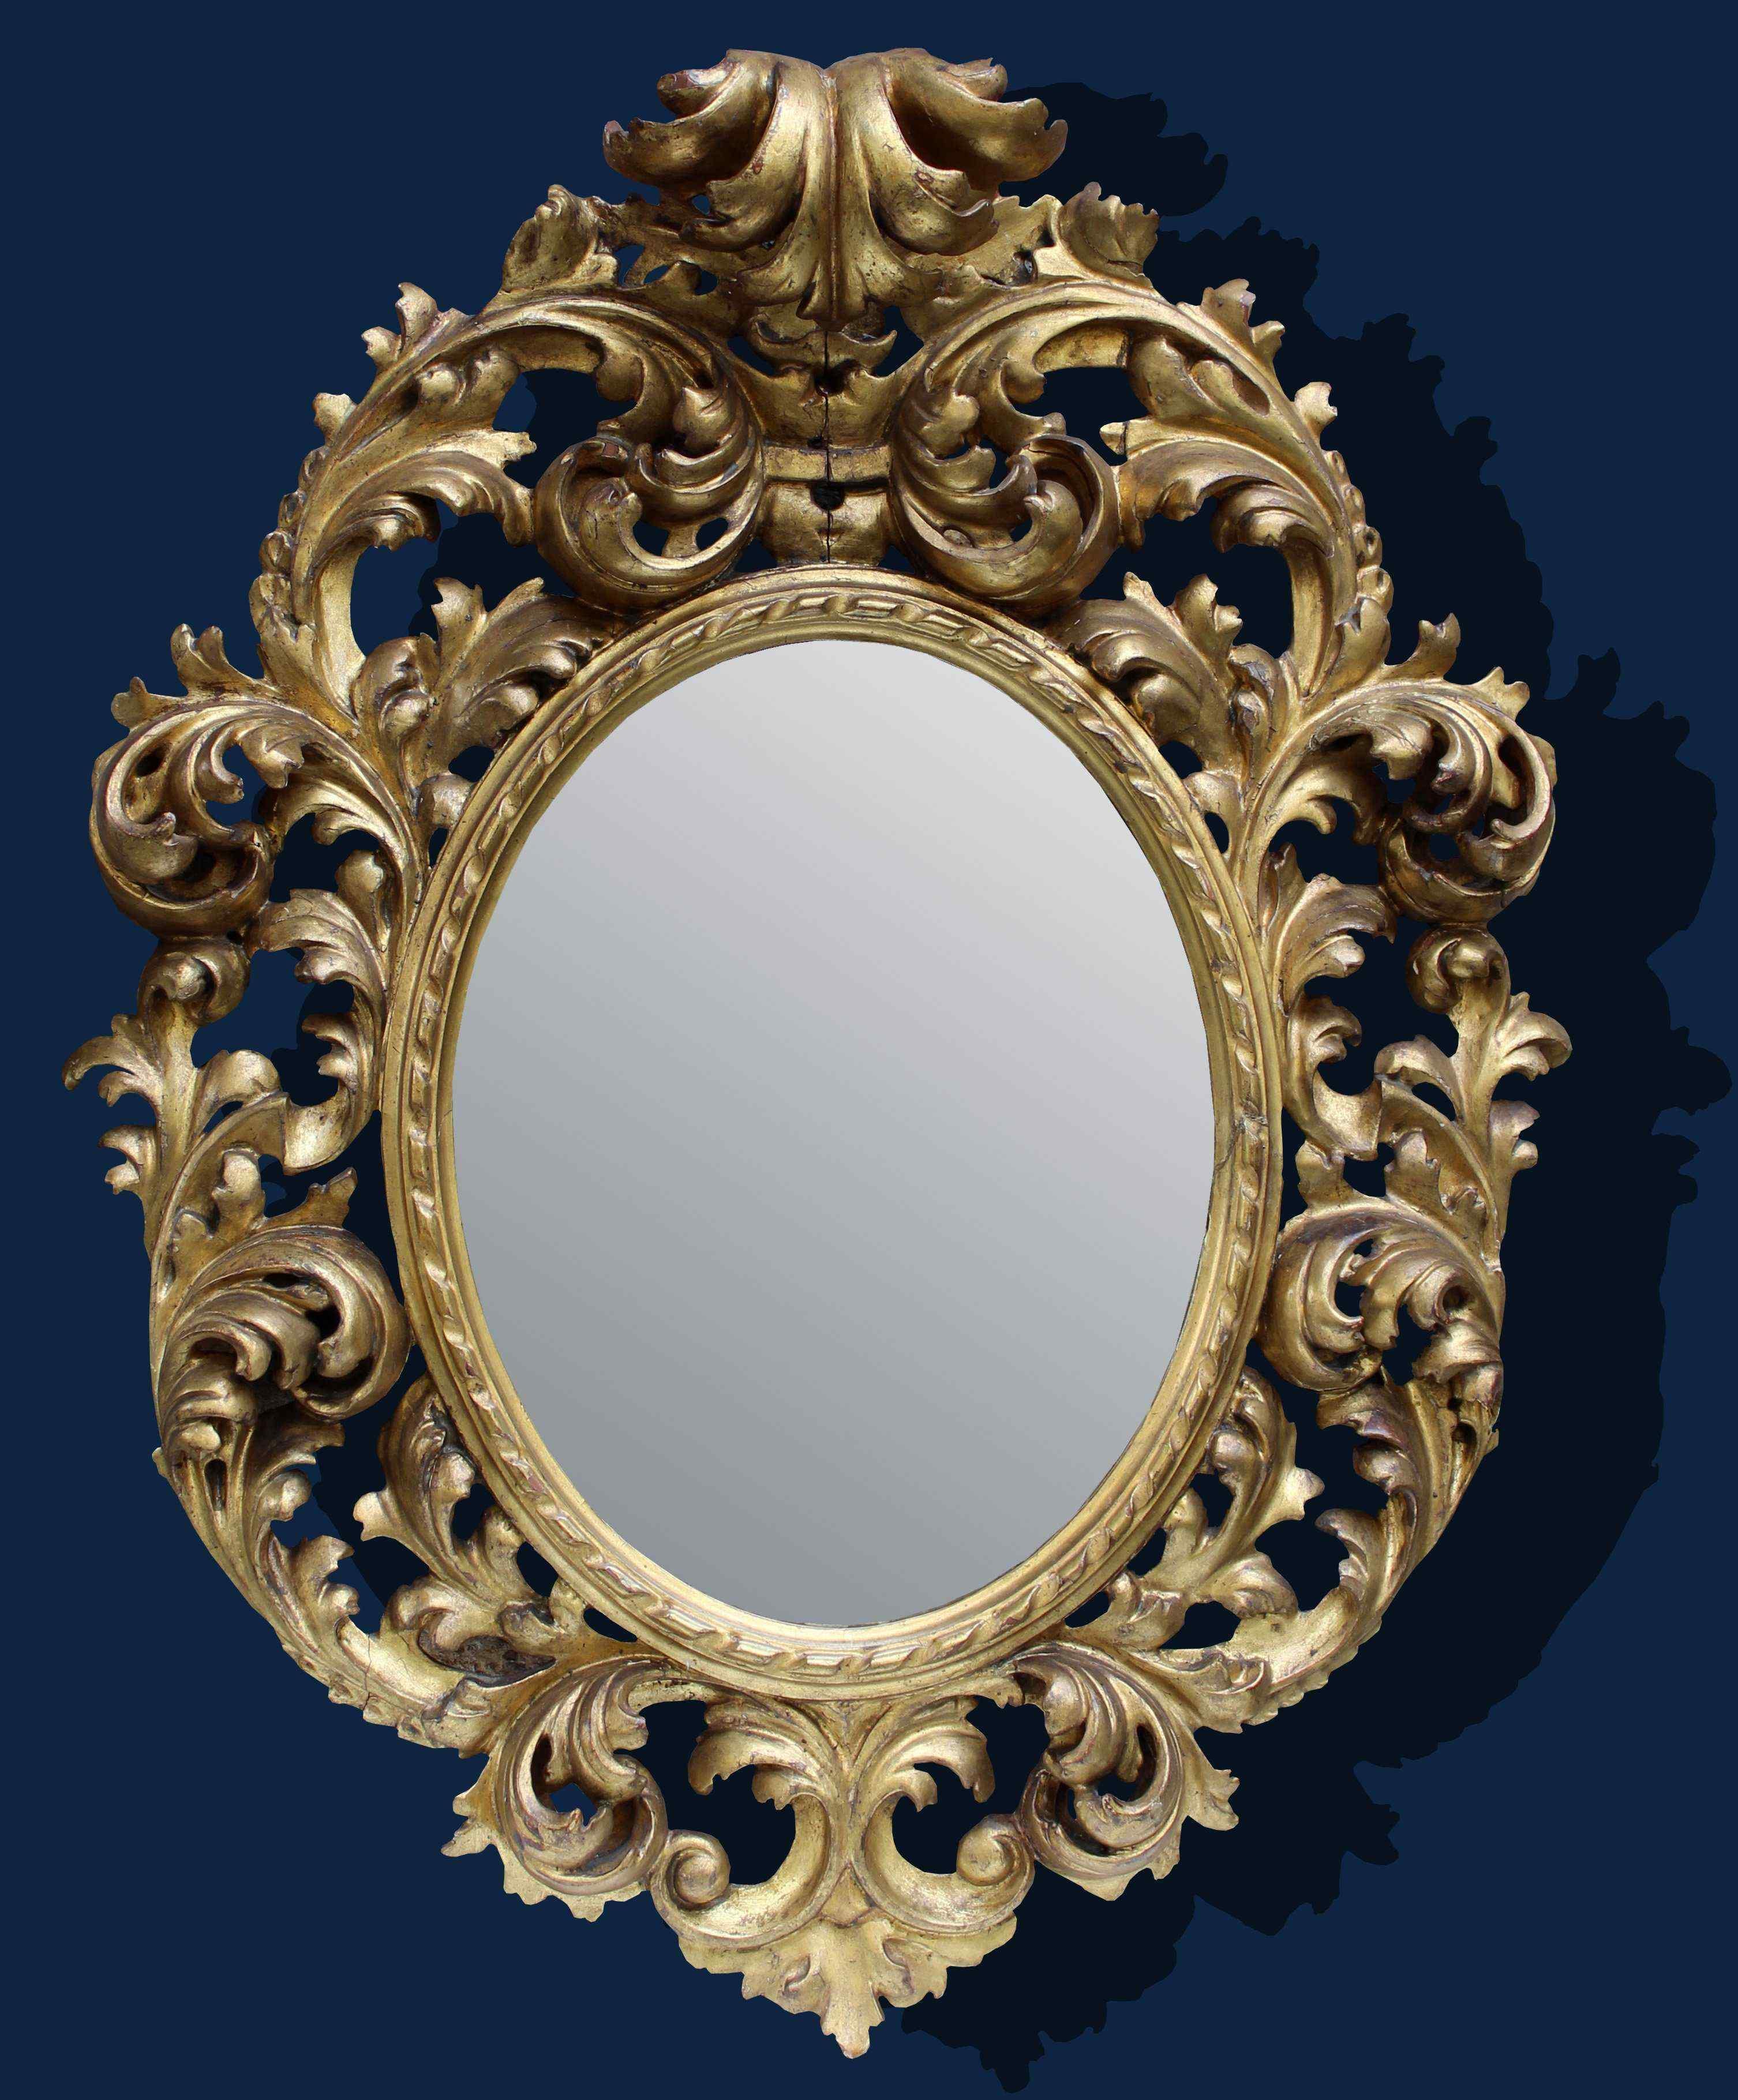 End of the XVIII century, Mirror